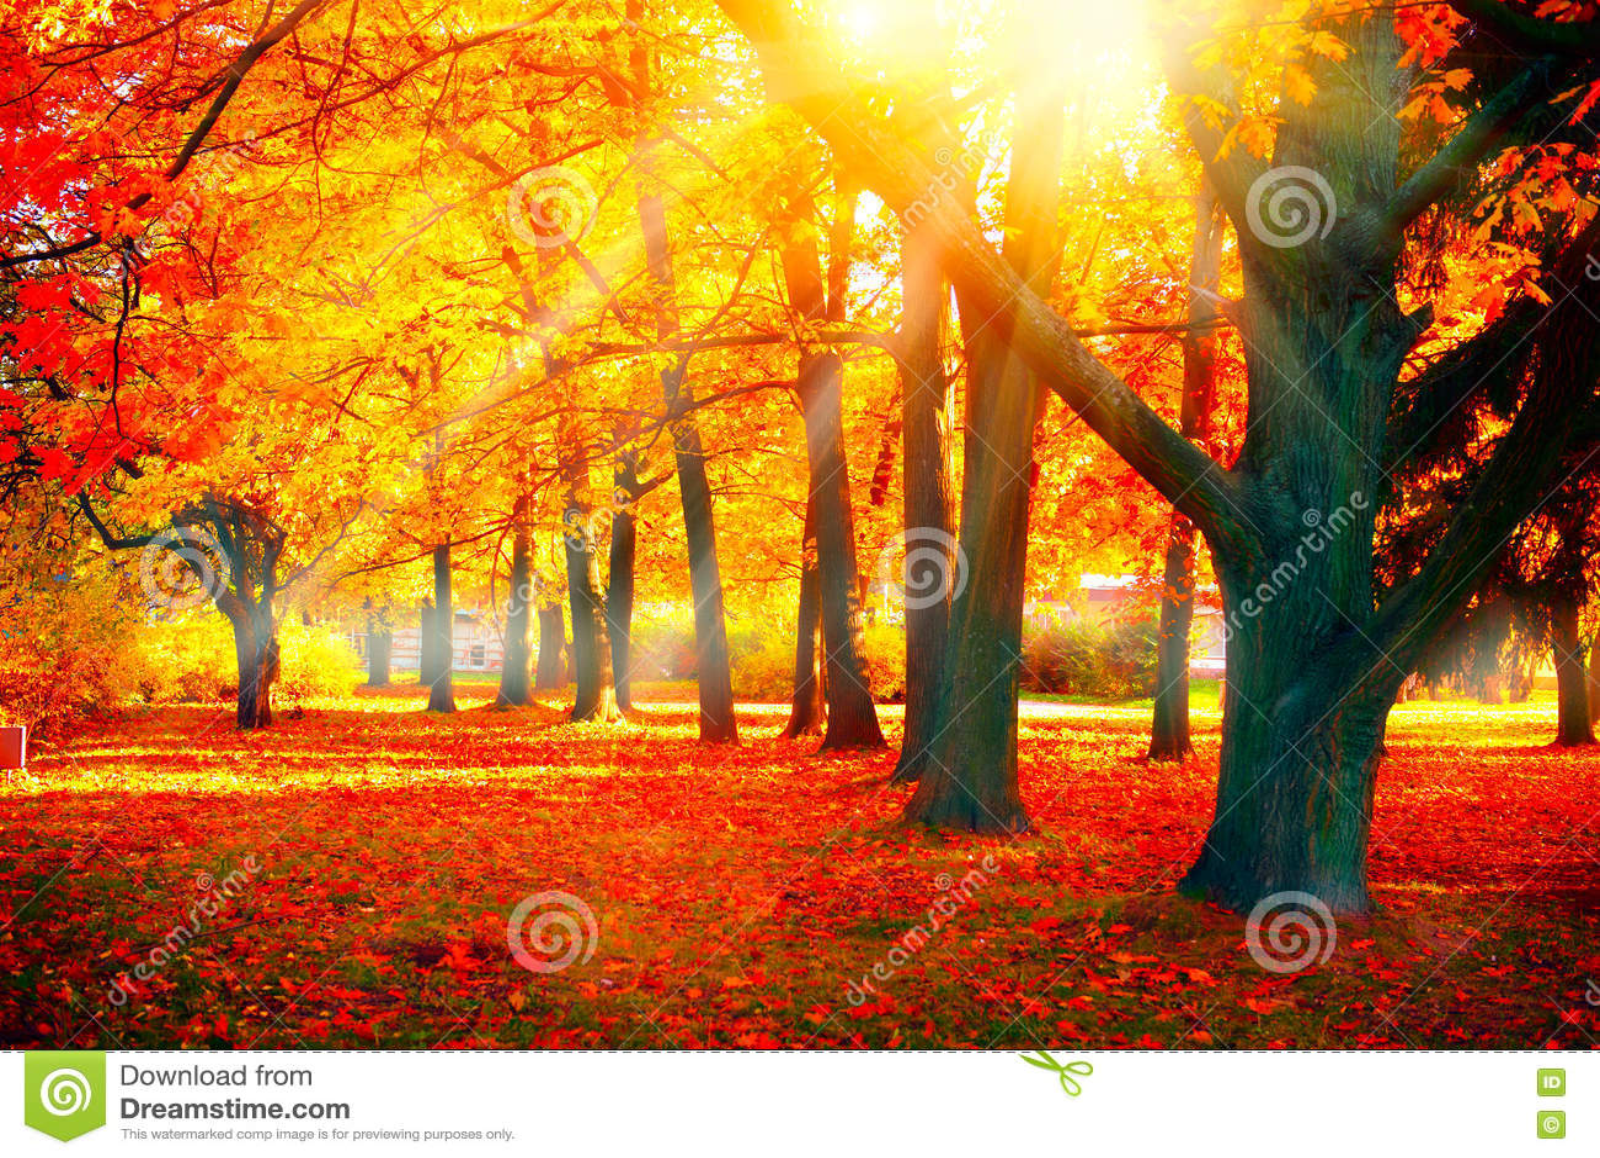 Herbst Fallnaturszene Herbstlicher Park